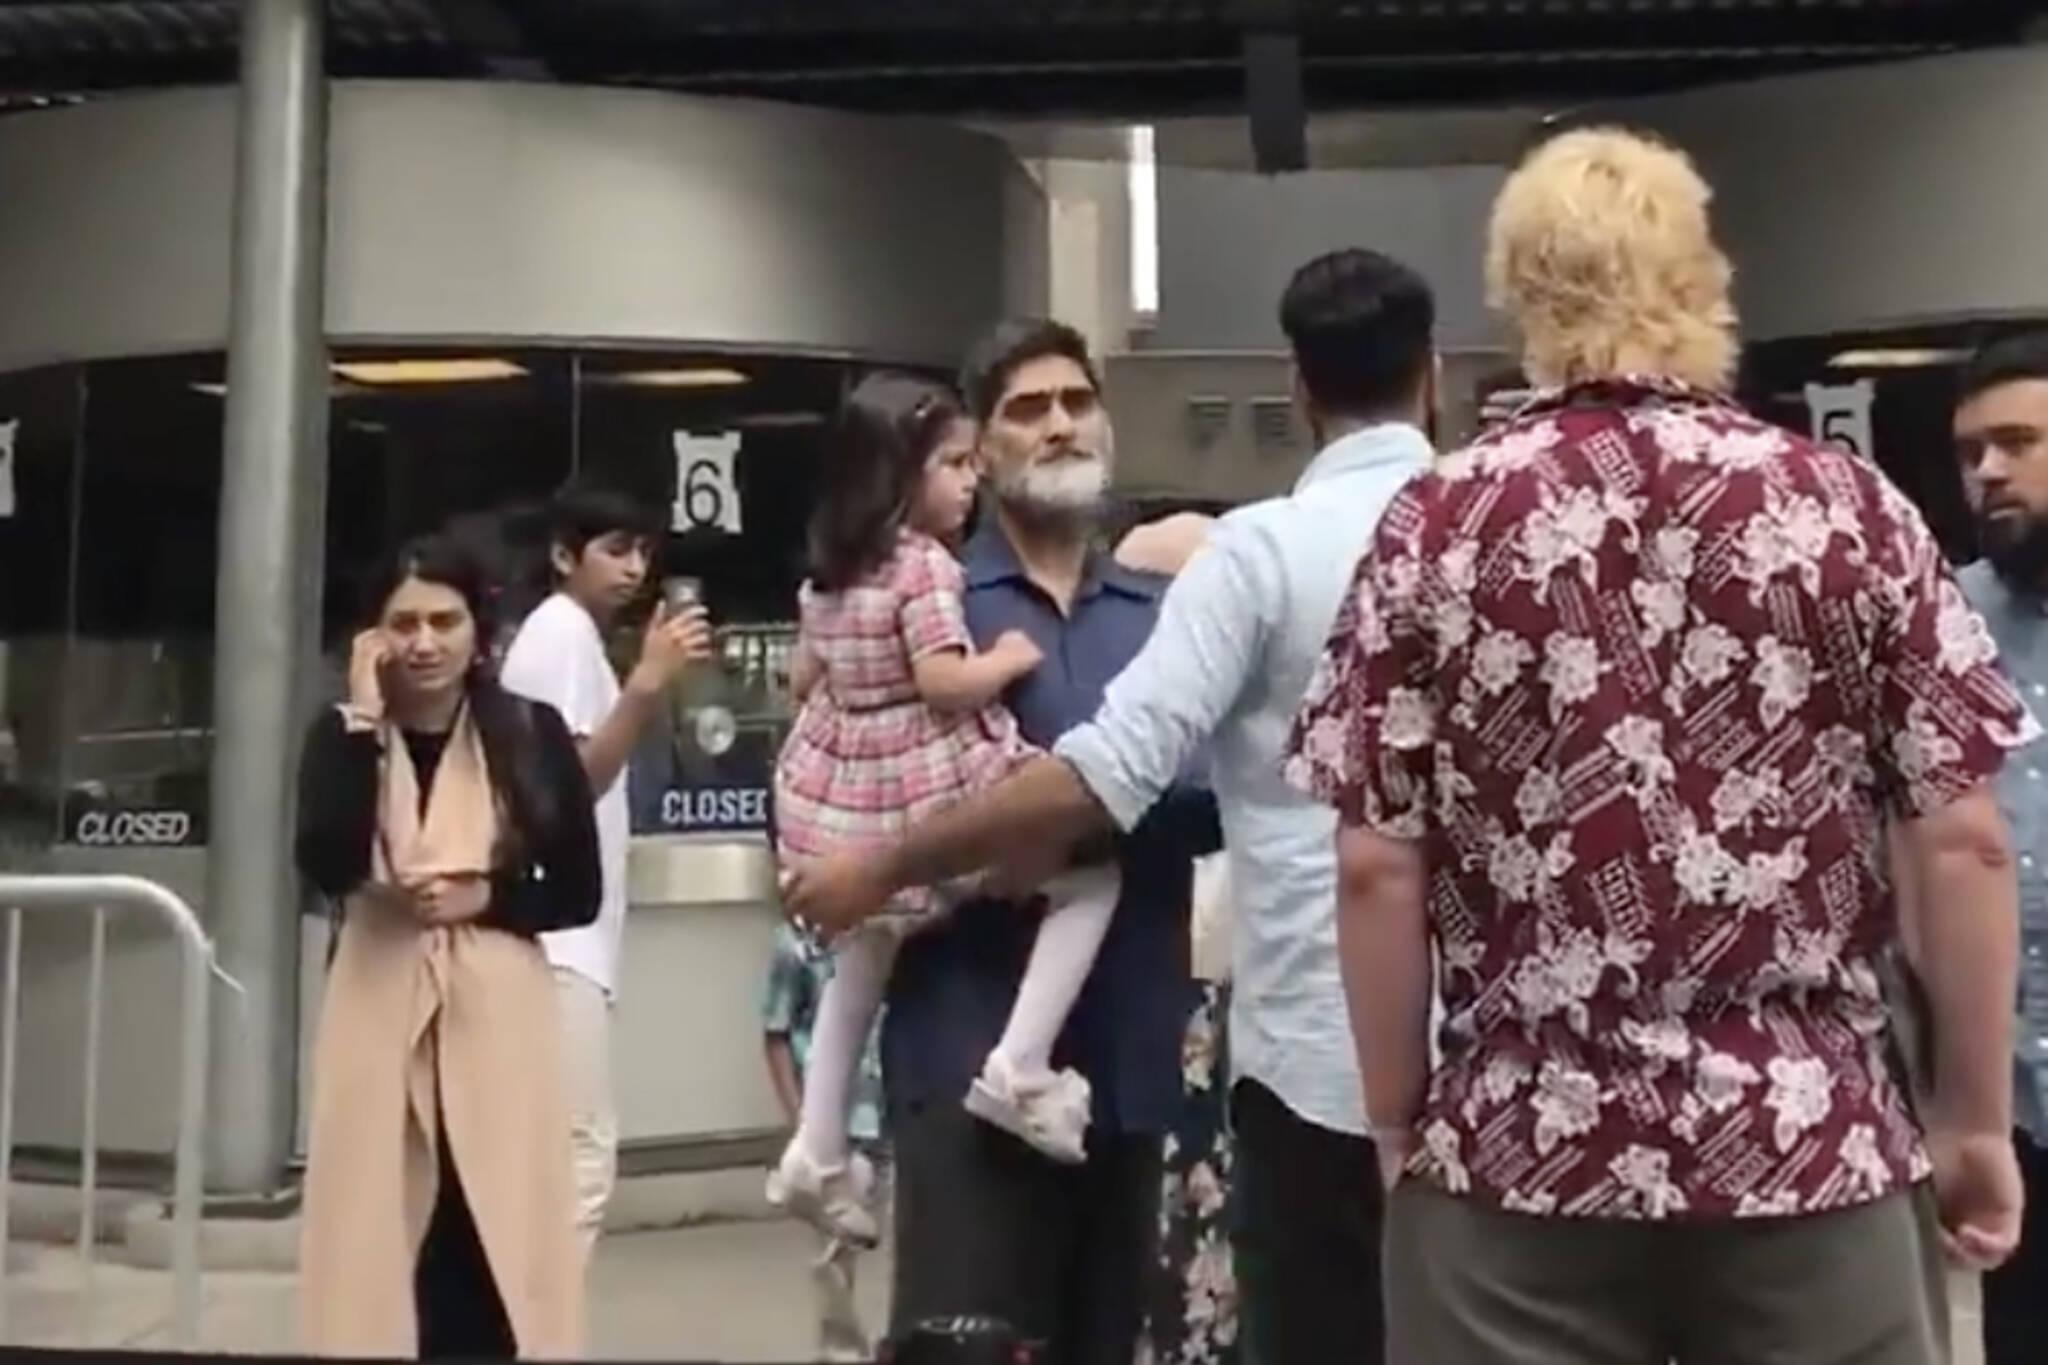 racist video toronto